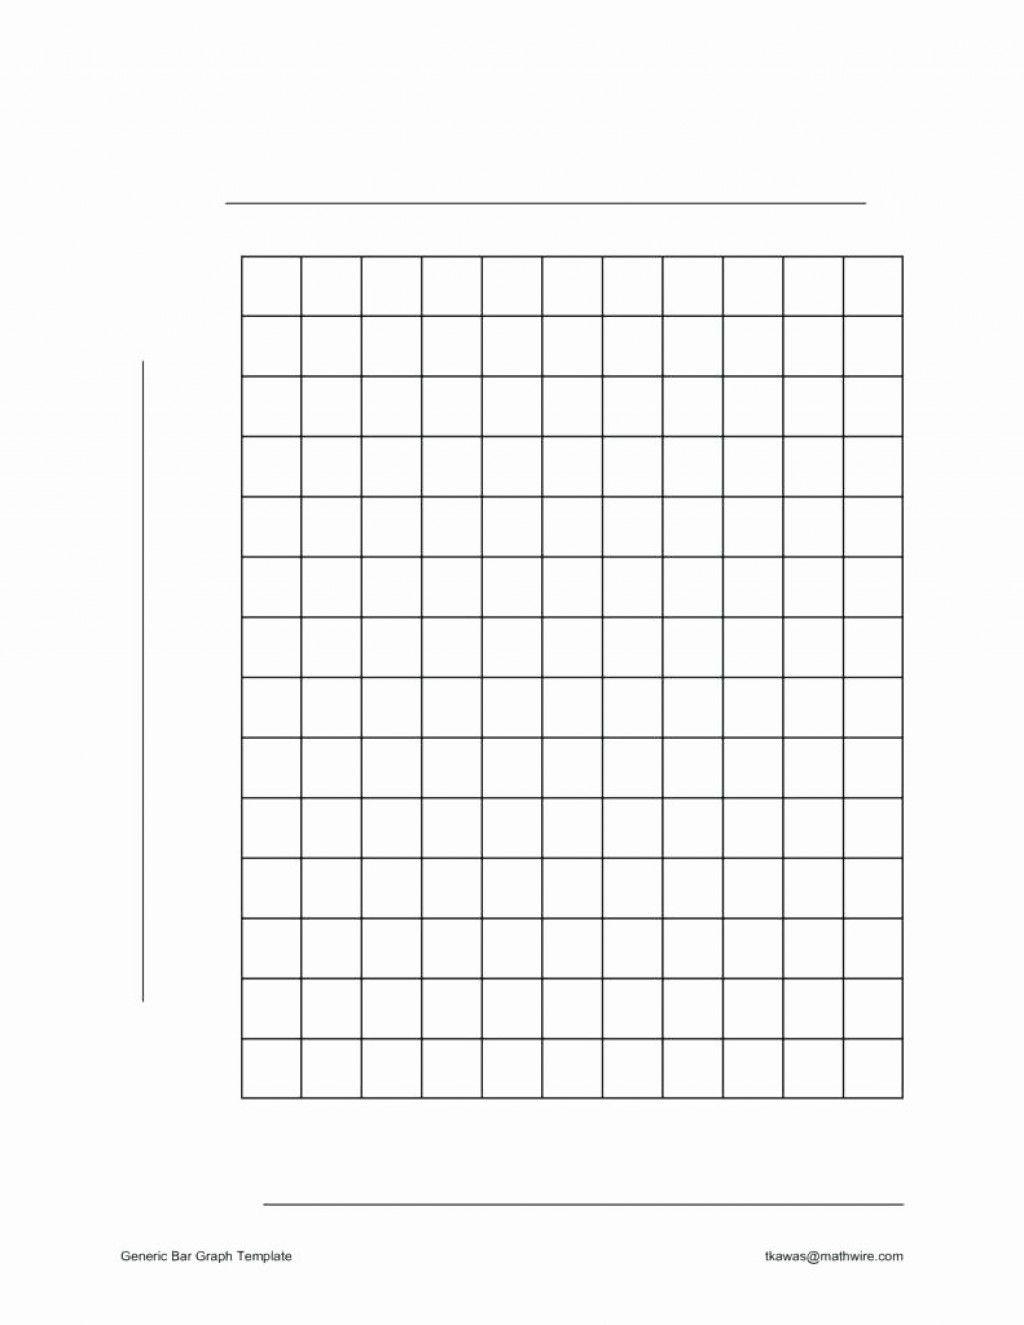 008 Bar Graph Template Blank Wondrous Ideas For